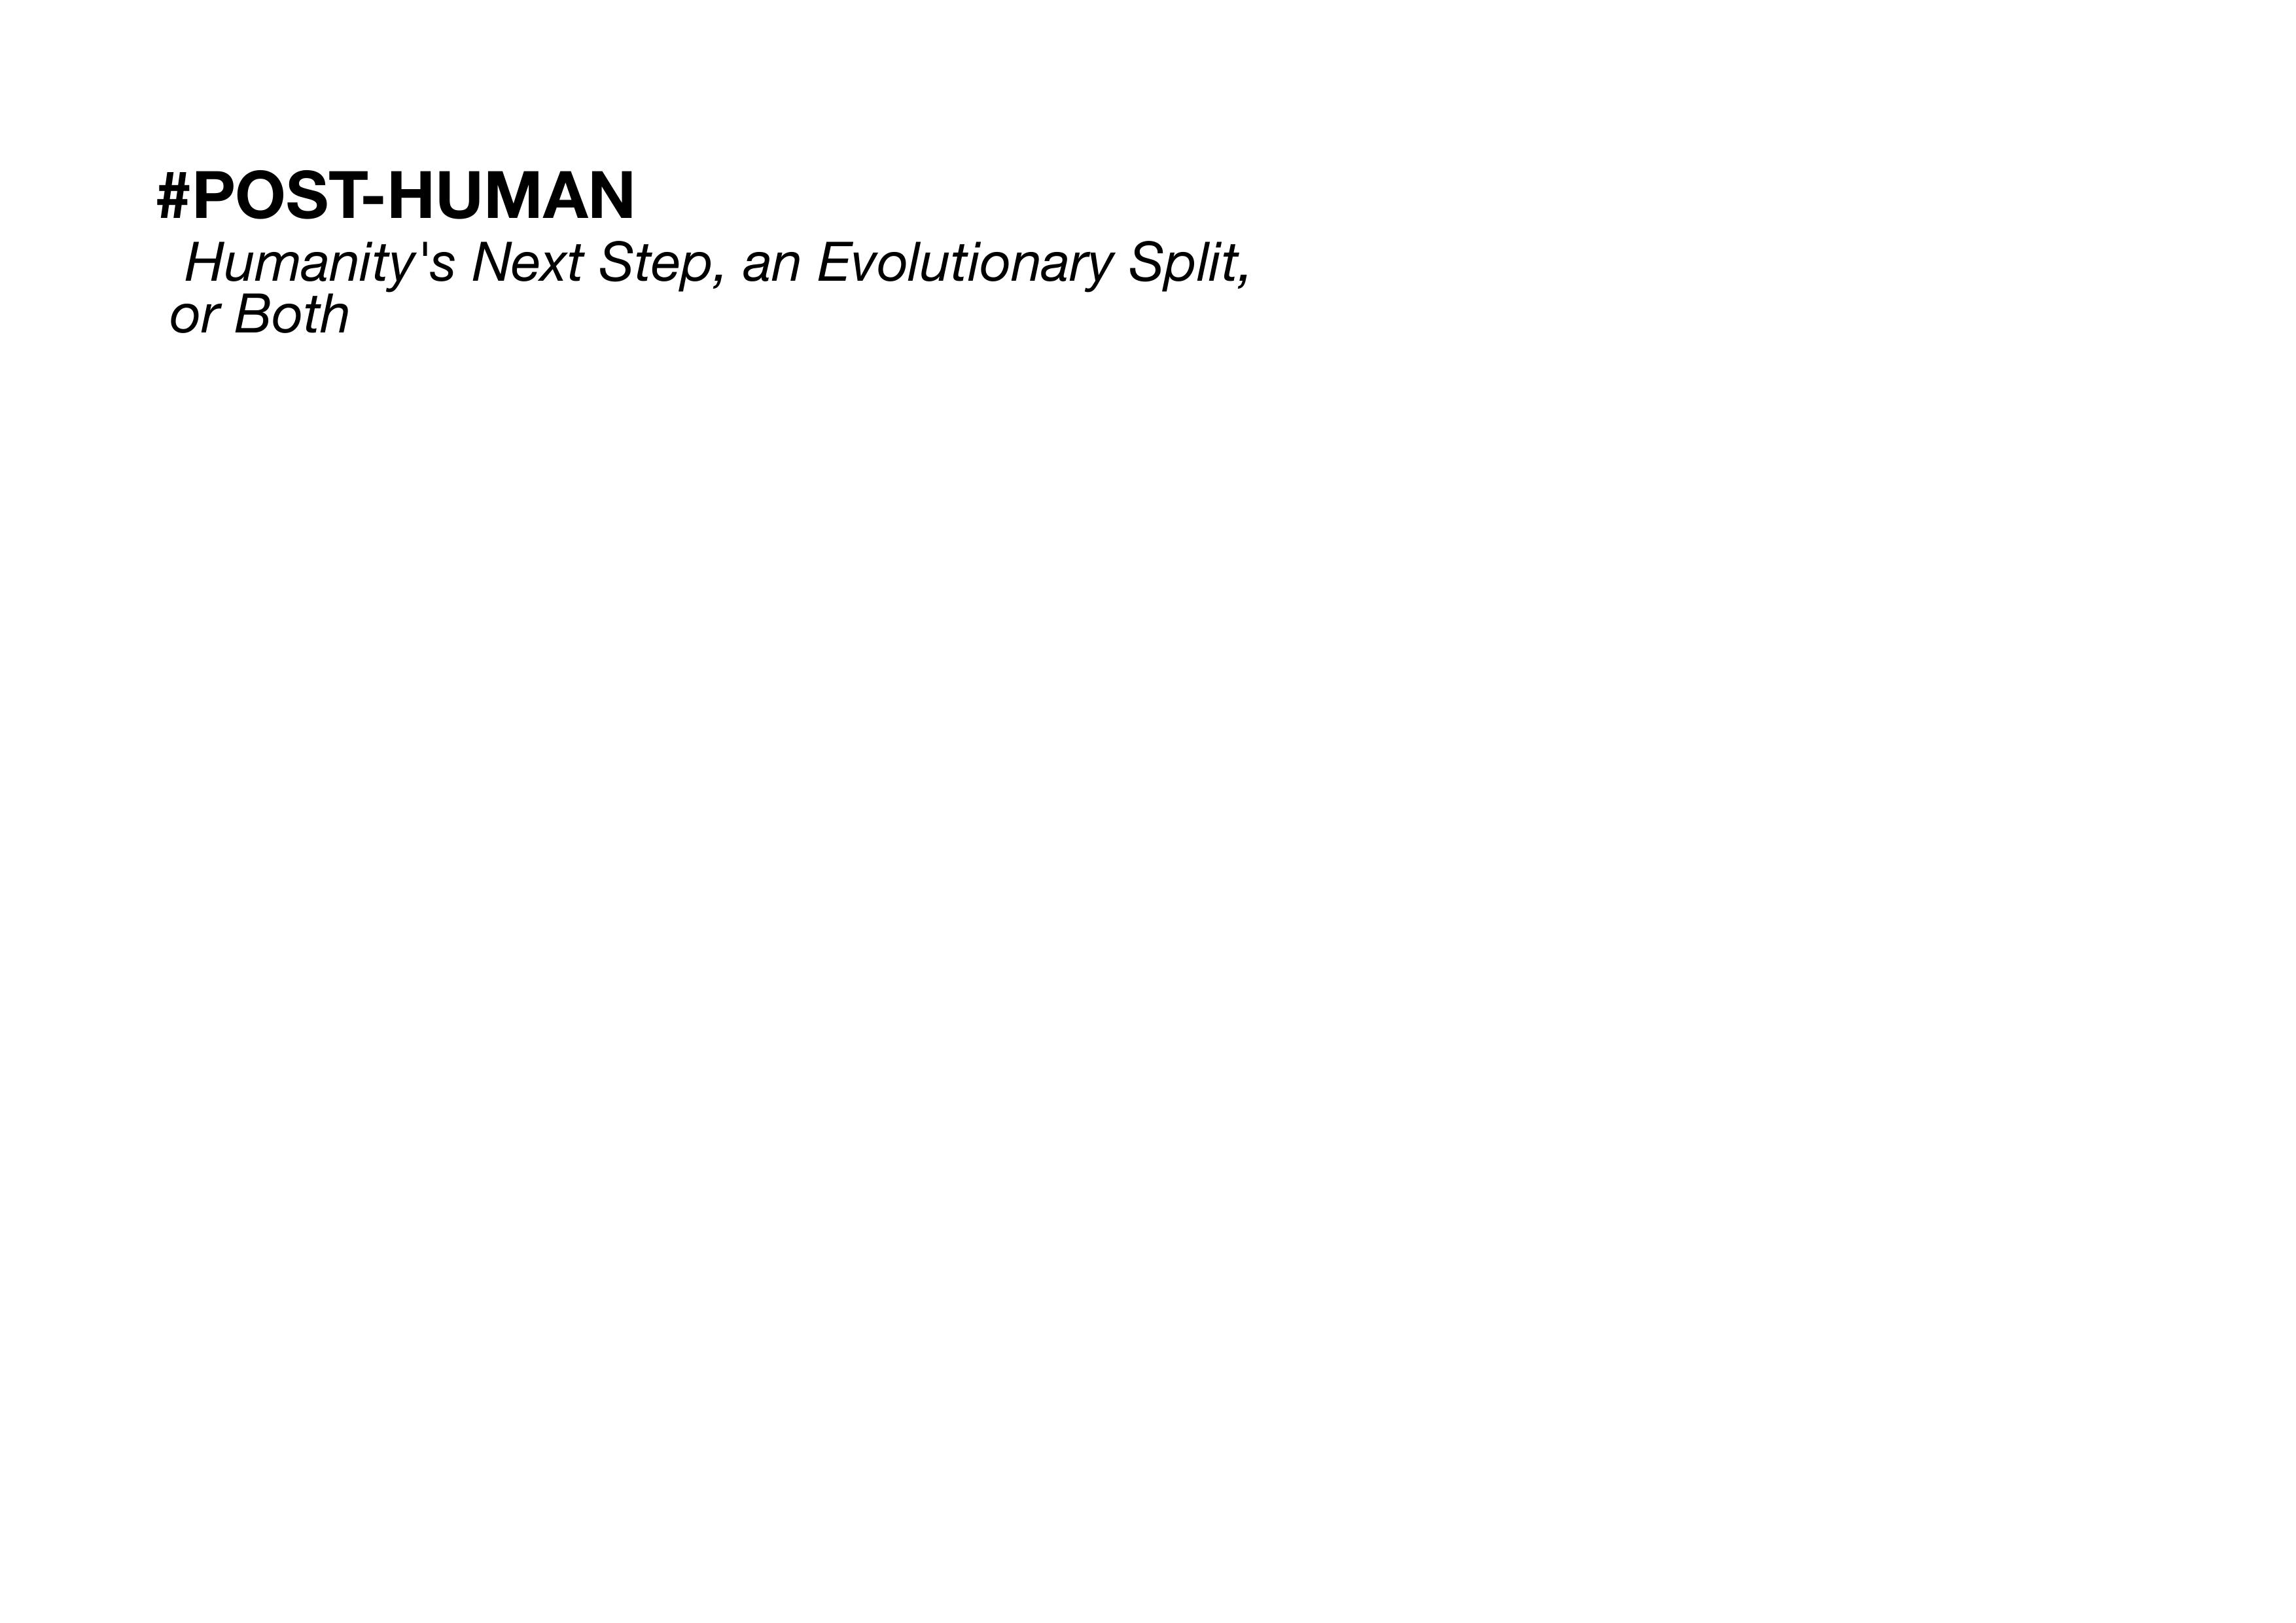 https://i.ibb.co/qJw2T49/Post-Human-Nick-Bostrom-Oxford-University-Edited-by-Ismael-Ogando-GROUND-June-2018